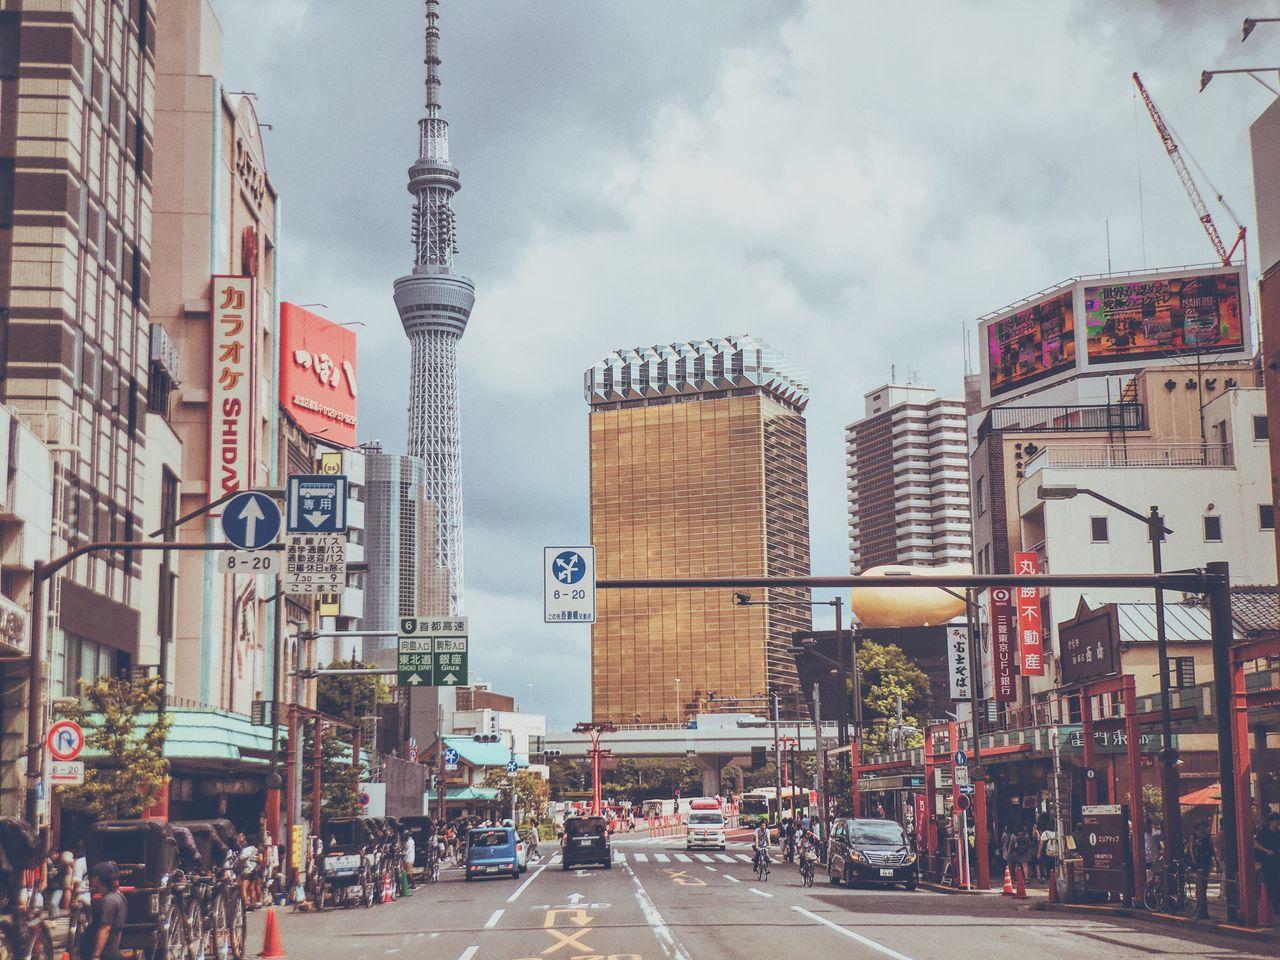 Japan Japan Photography Tokyo Tokyo,Japan Skytree 晴空塔 天空樹 Building 日本 東京 街頭 Street First Eyeem Photo